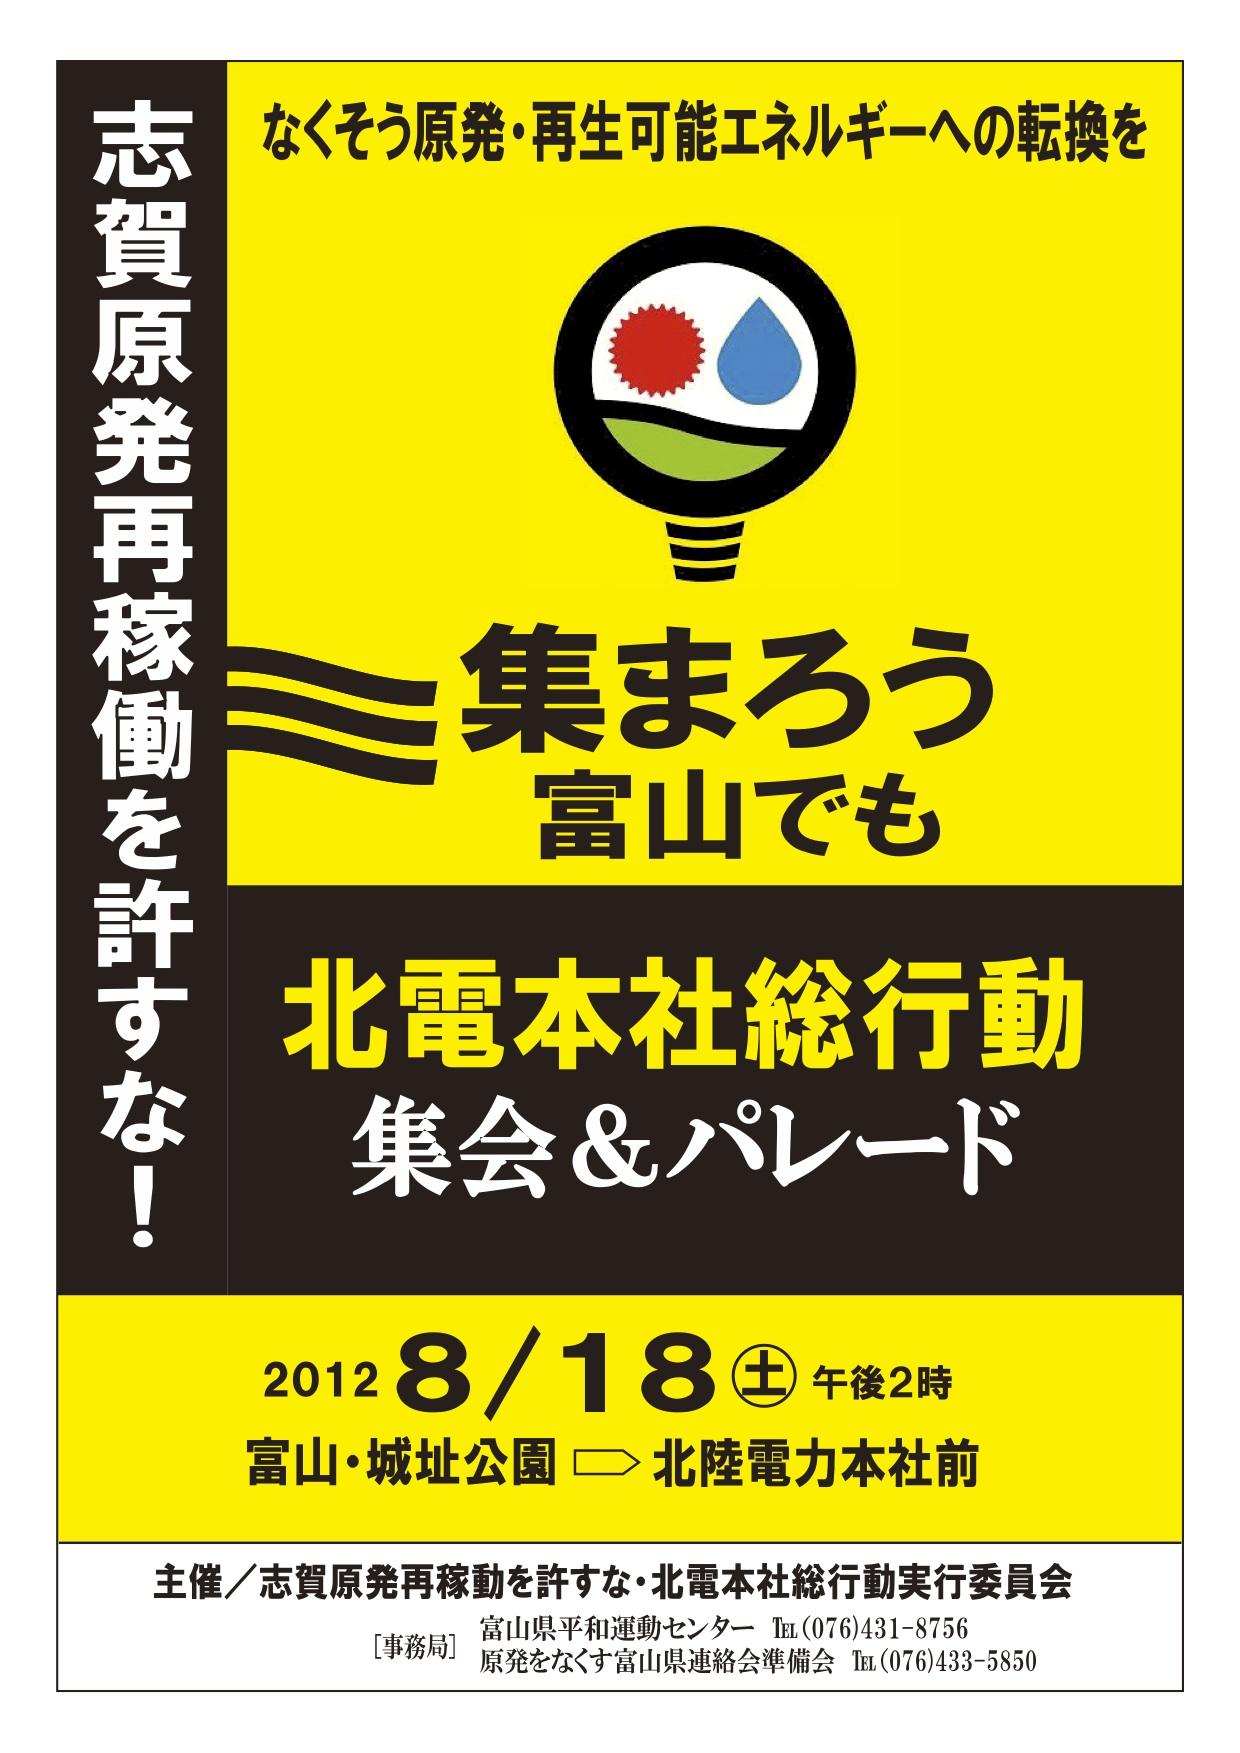 20120818富山原発行動(ビラ表)